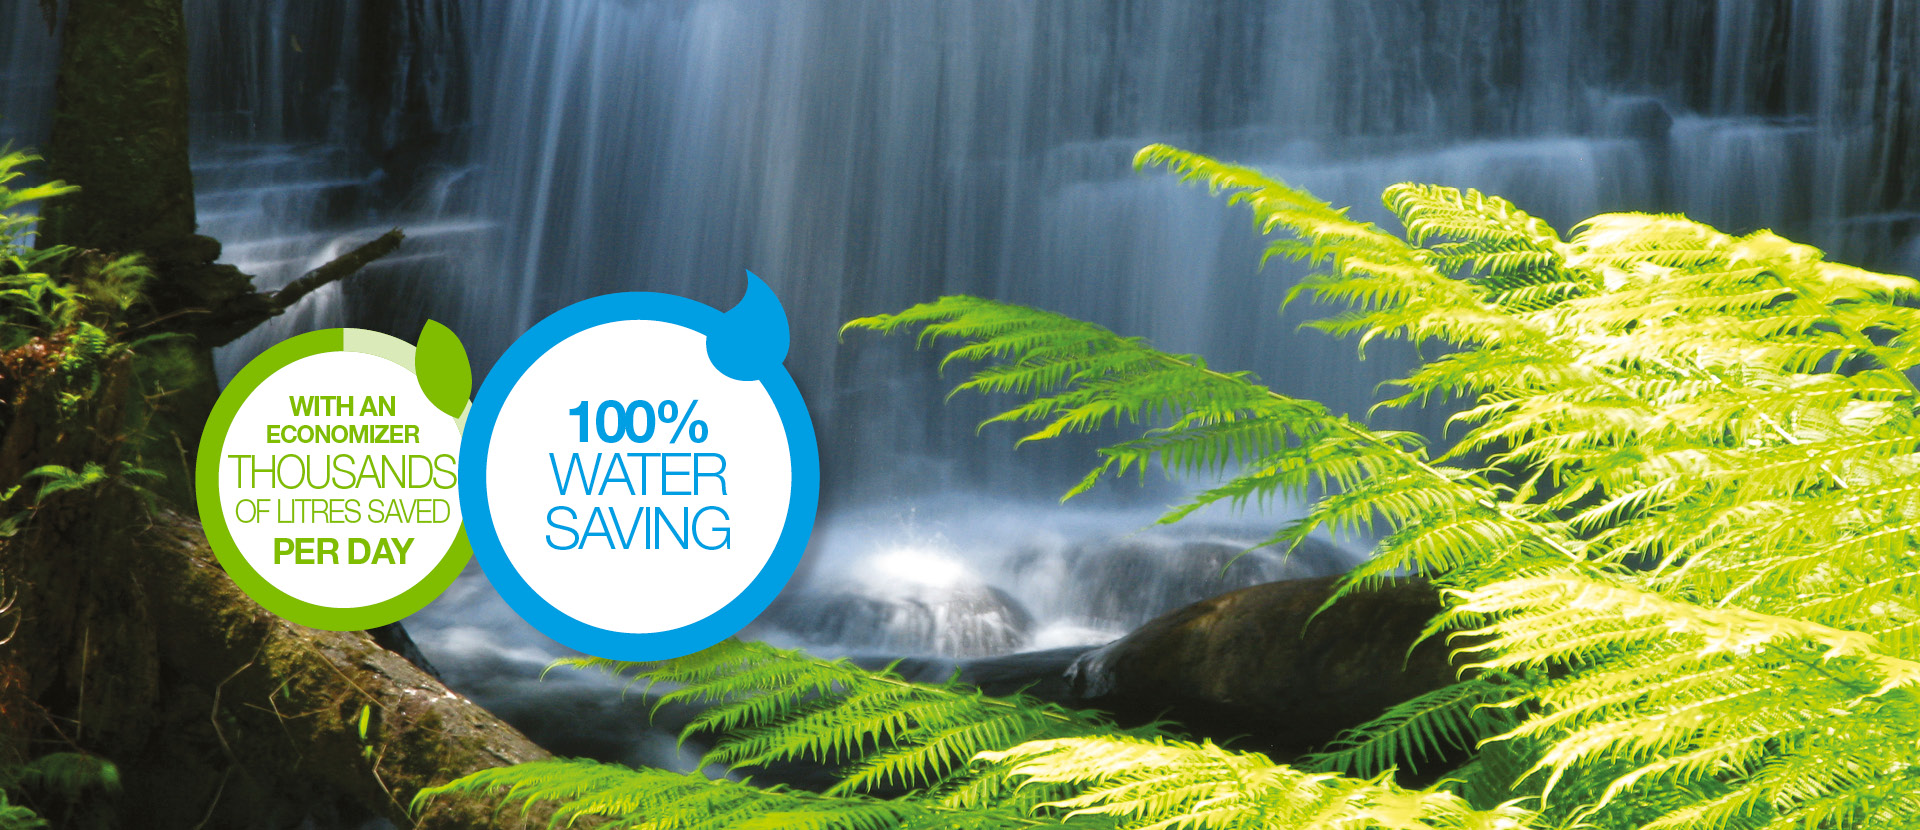 BRX _ Economizer water saving thousands litres saved